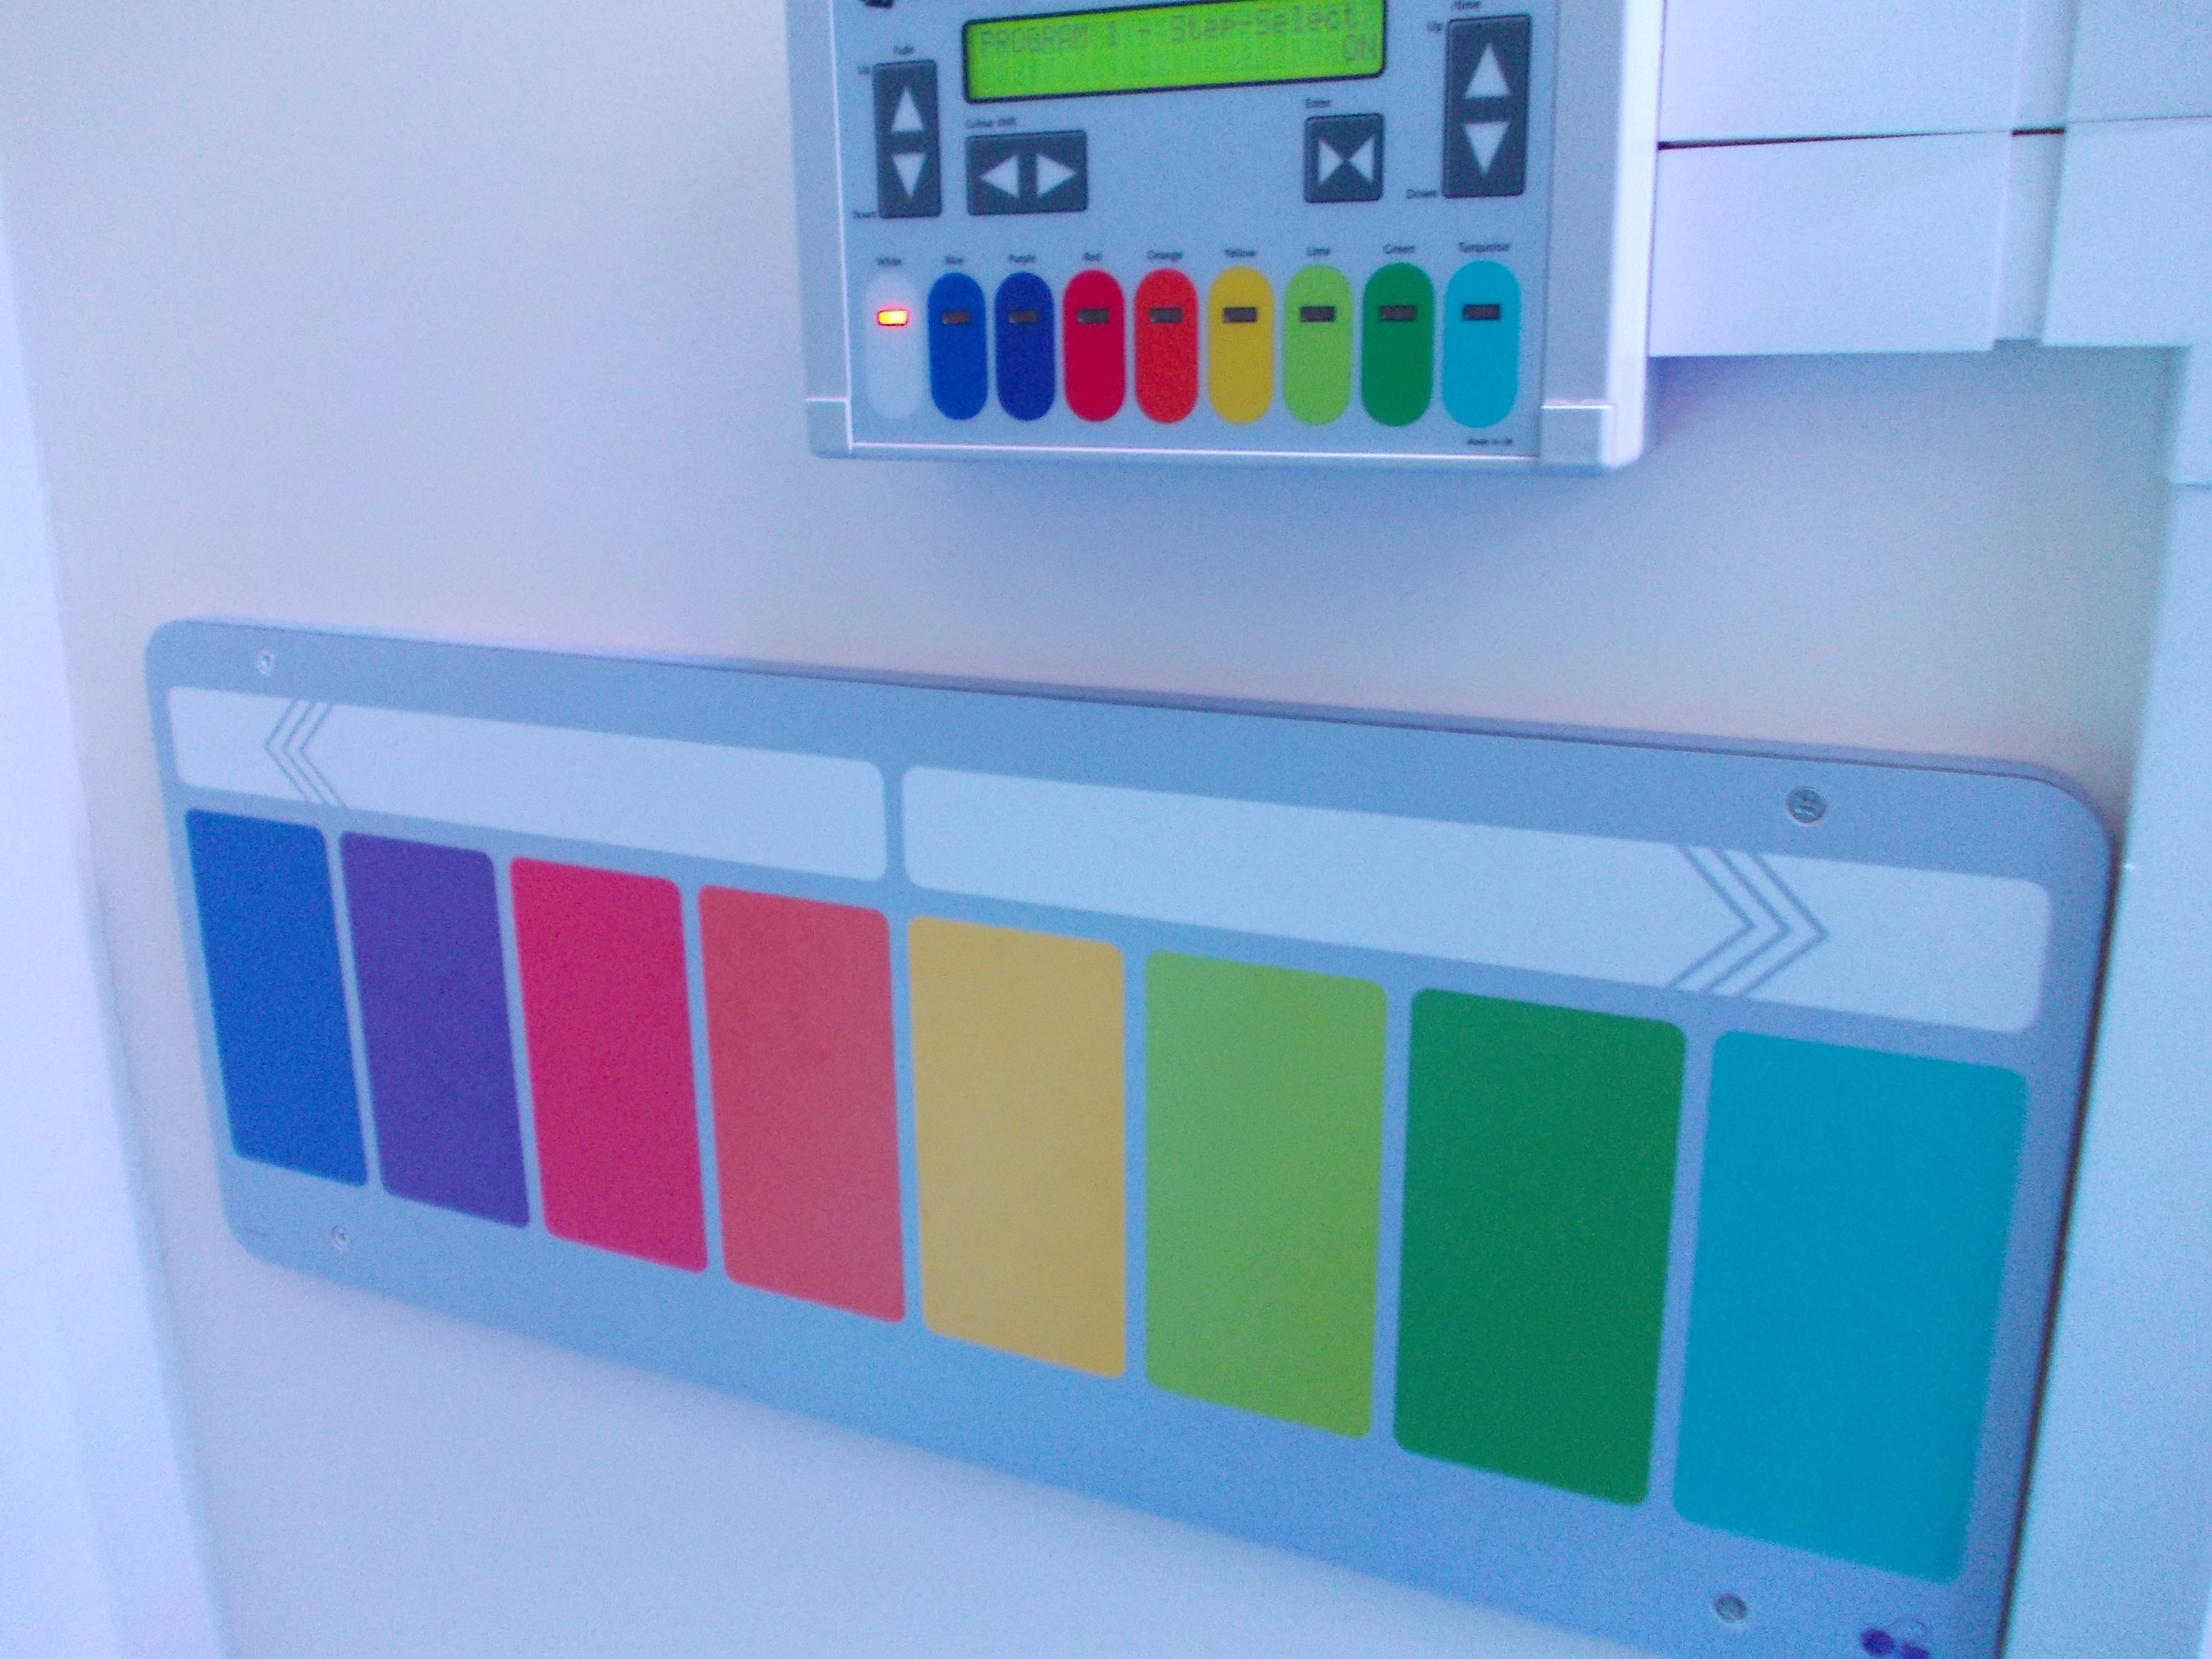 Main Sensory Room - Interactive Controls